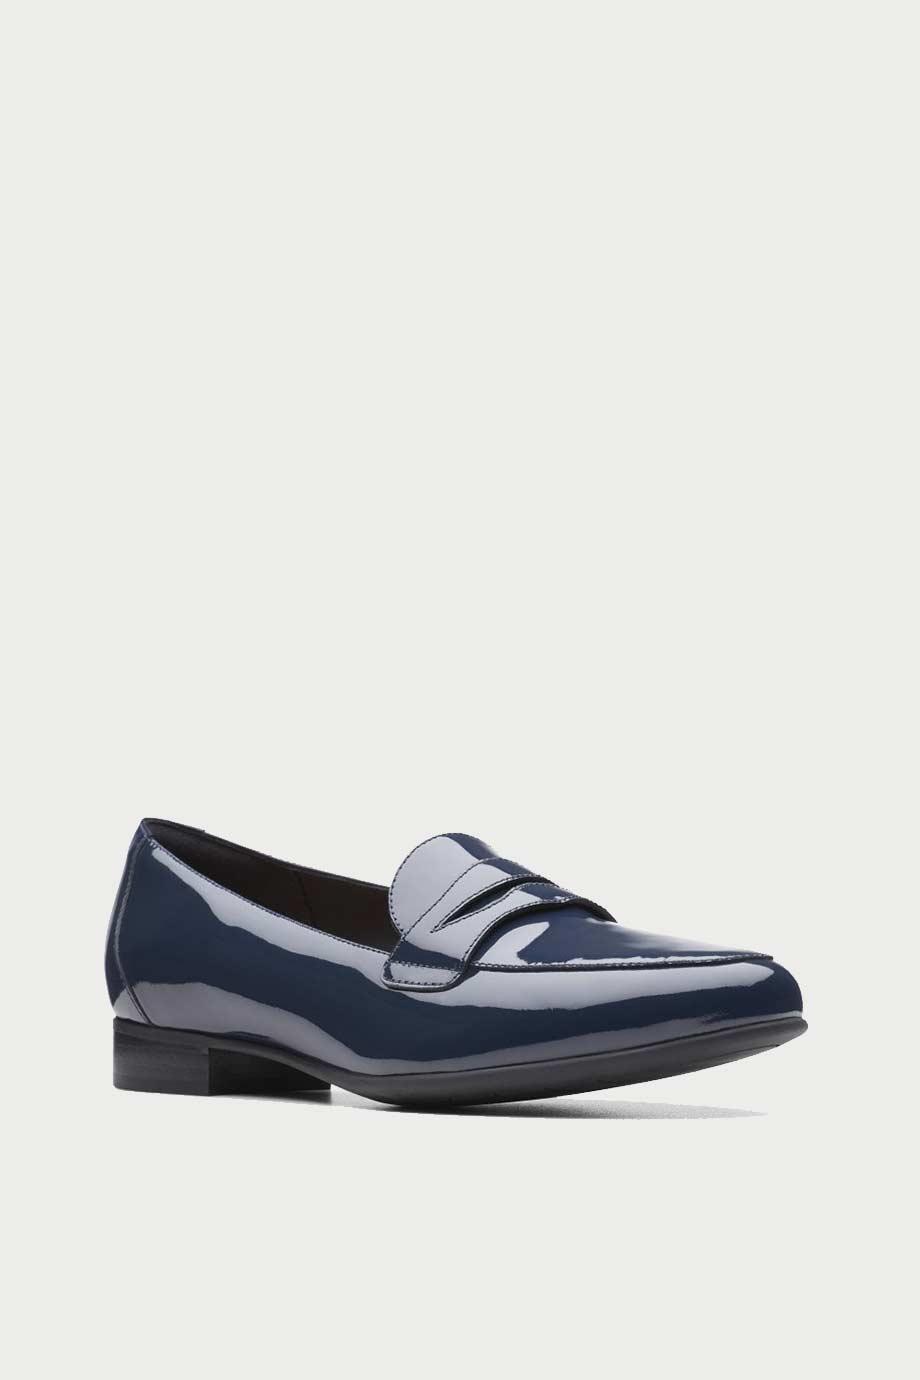 spiridoula metheniti shoes xalkida p un blush go clarks navy patent 1 1